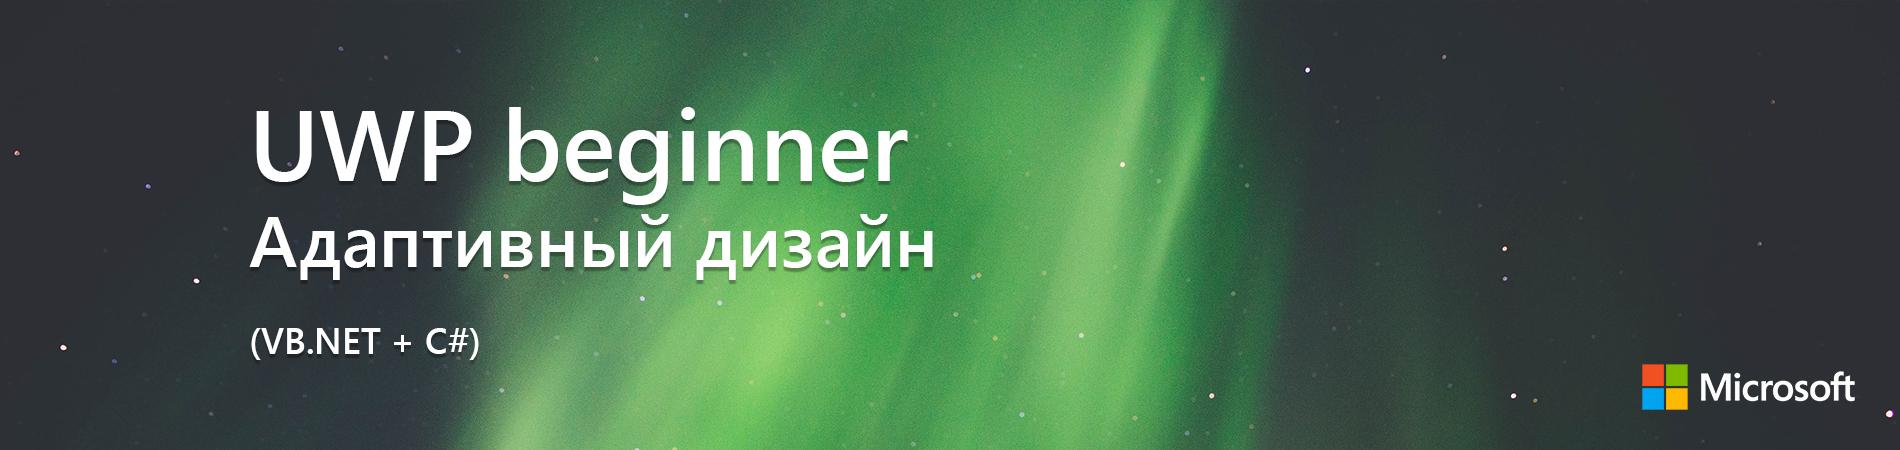 UWP beginner: Адаптивный дизайн (VB.NET + C#)